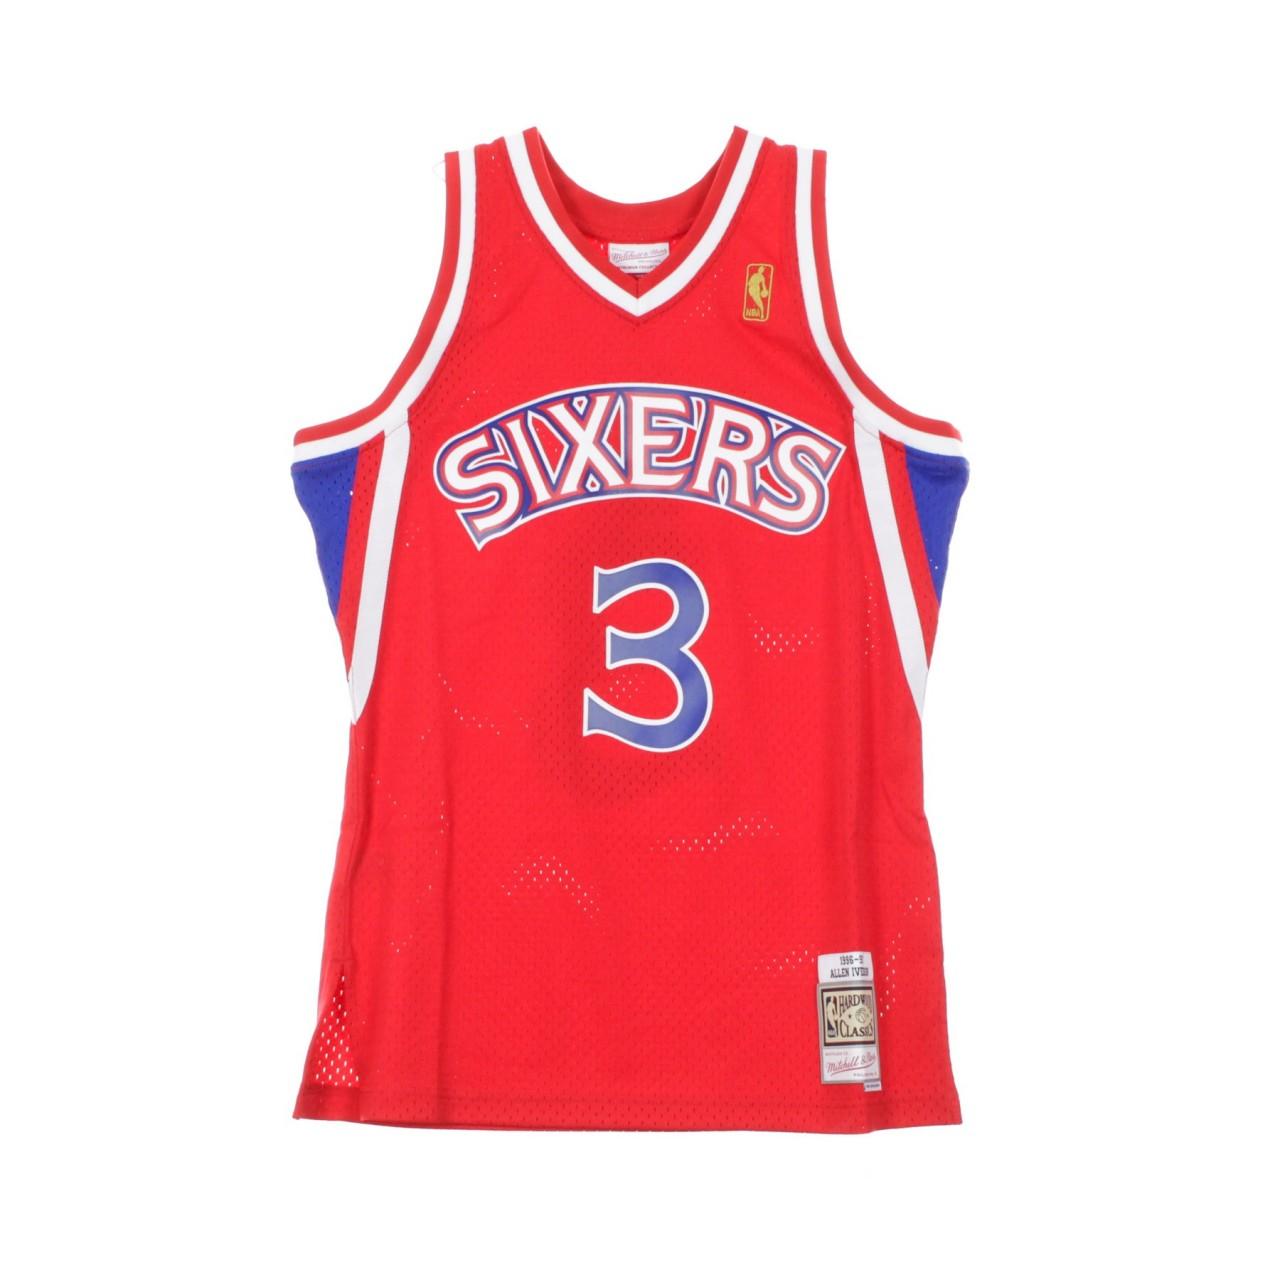 MITCHELL & NESS NBA SWINGMAN JERSEY ALLEN IVERSON NO.3 1996-97 PHI76E ROAD SMJYGS18199-P76SCAR96AIV